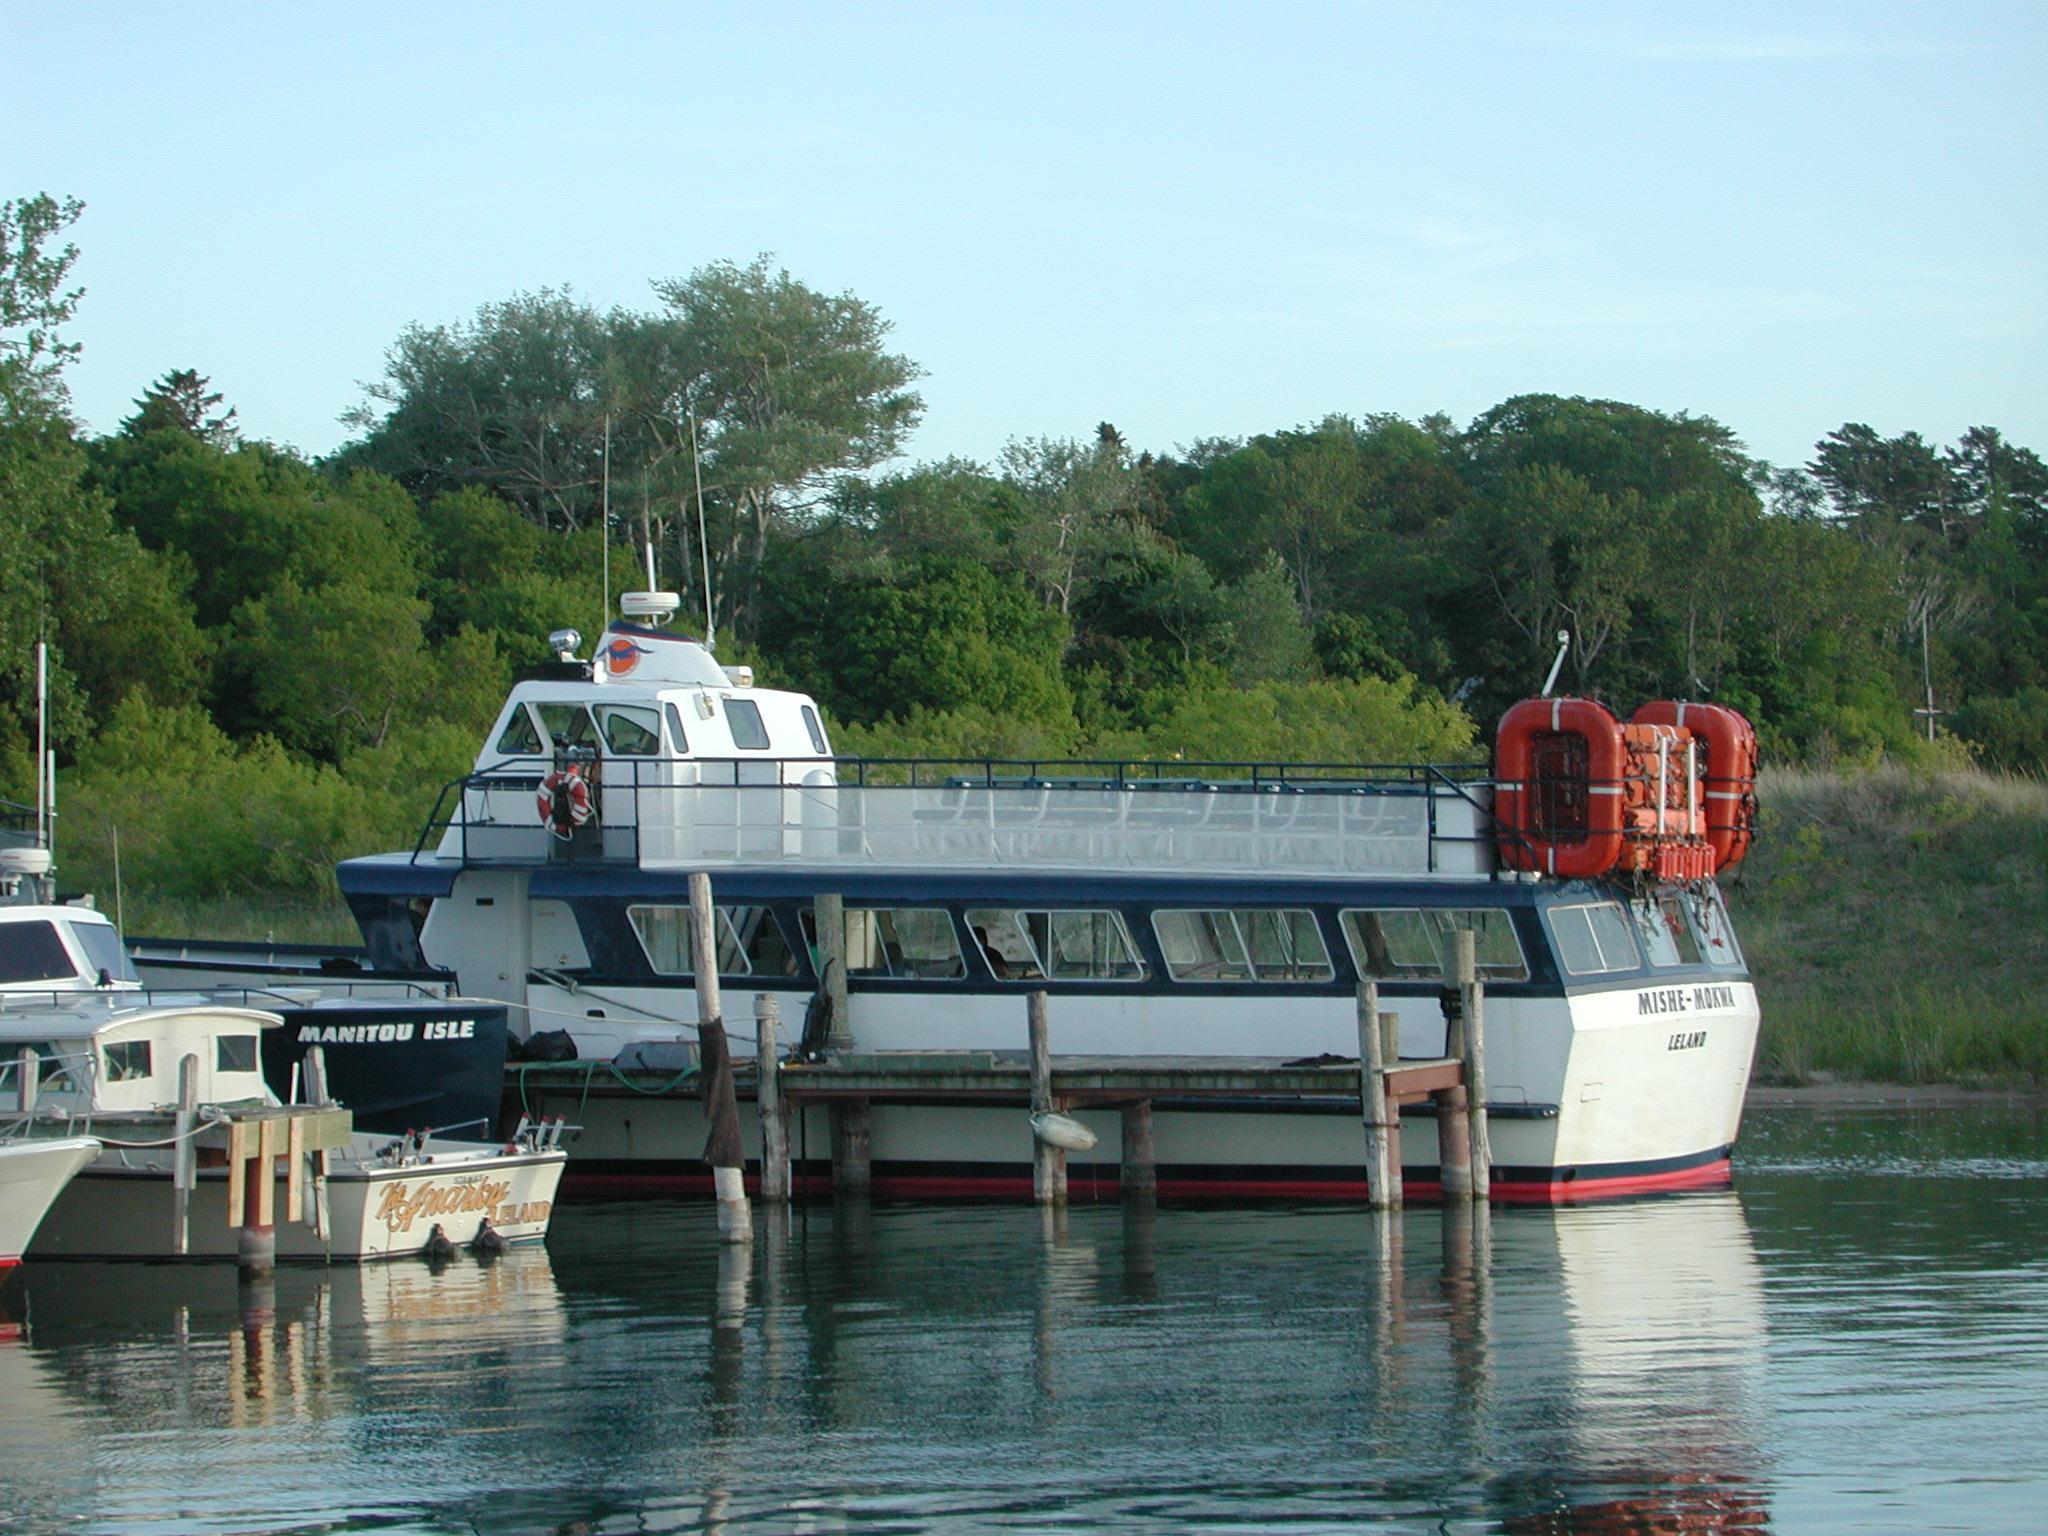 Leland - Sleeping Bear Island Transit